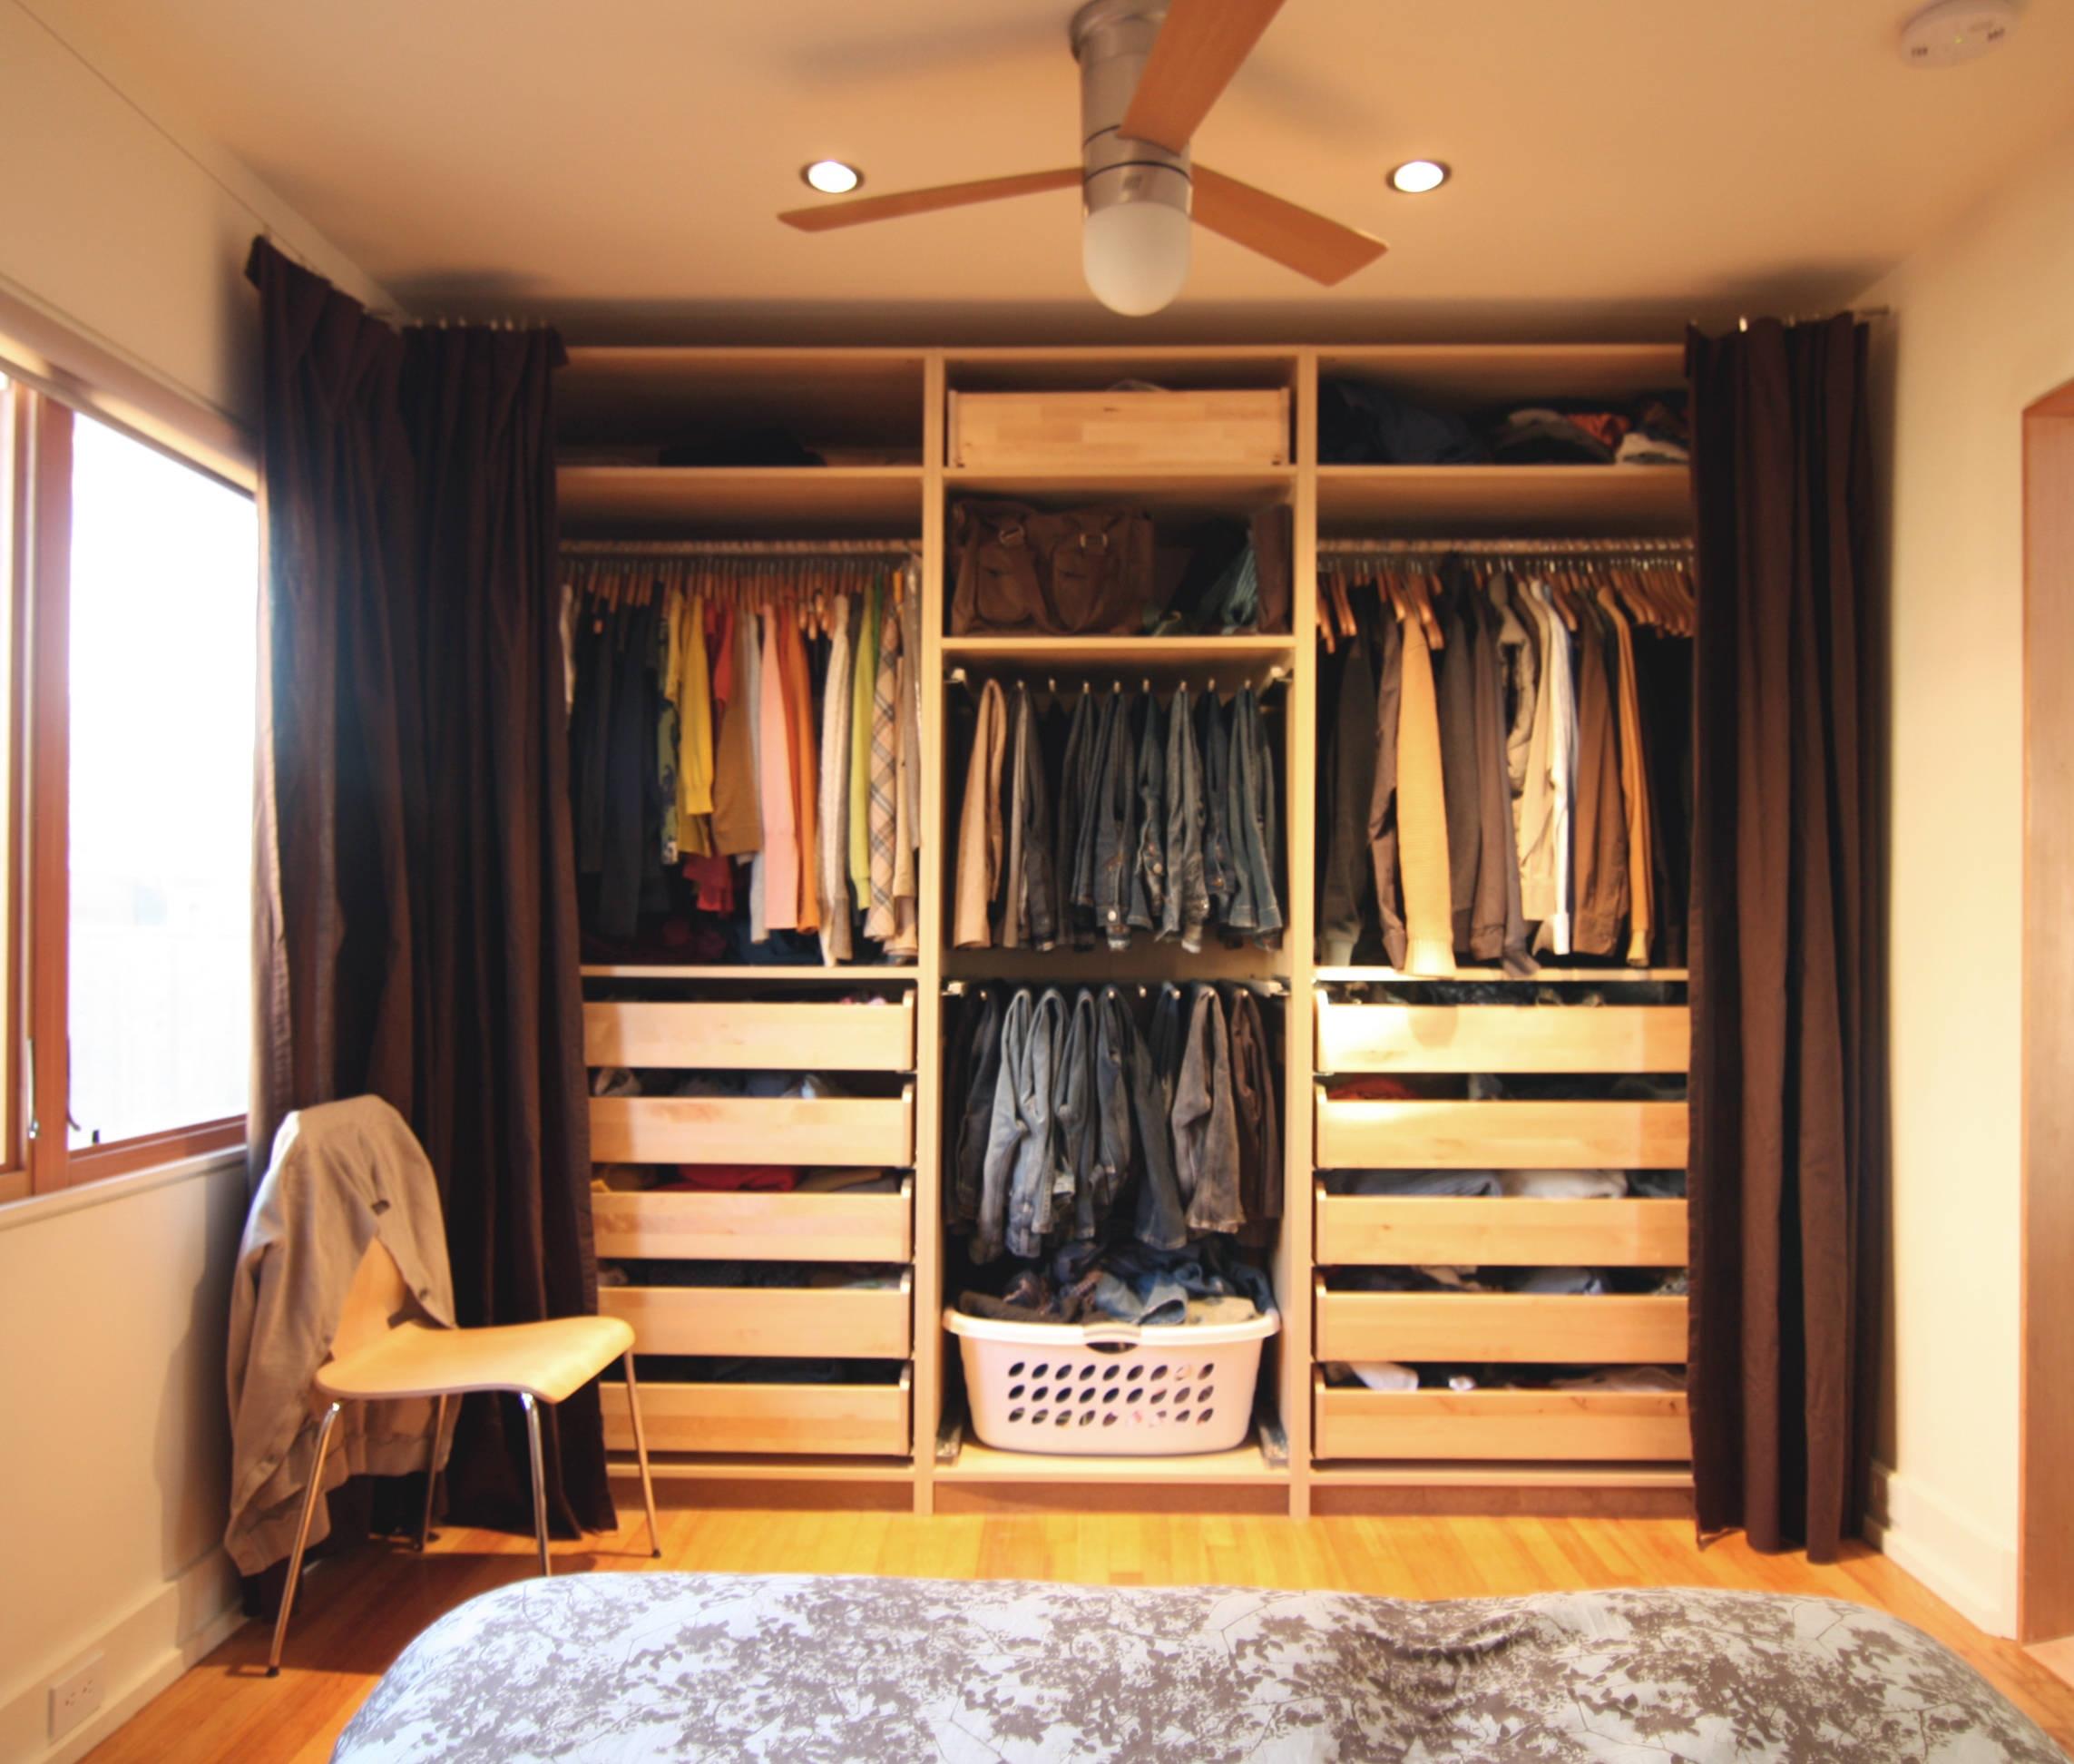 Дизайн интерьера гардеробной комнаты - 100 фото новинок 2017.